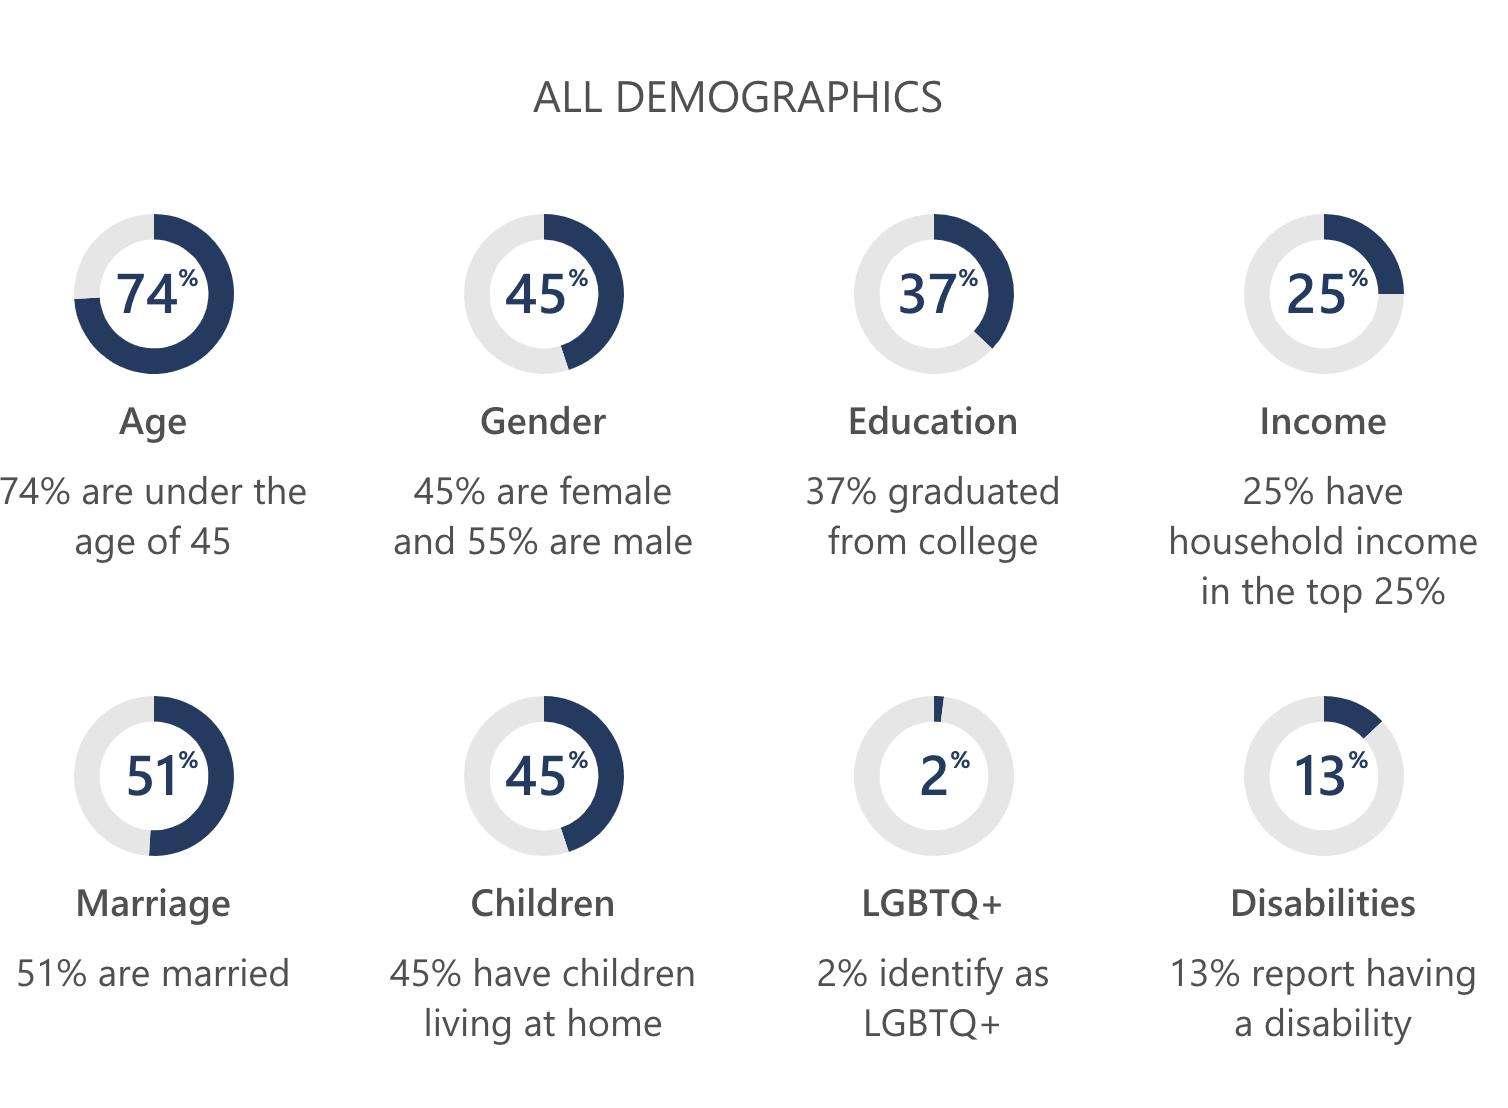 bing-demography